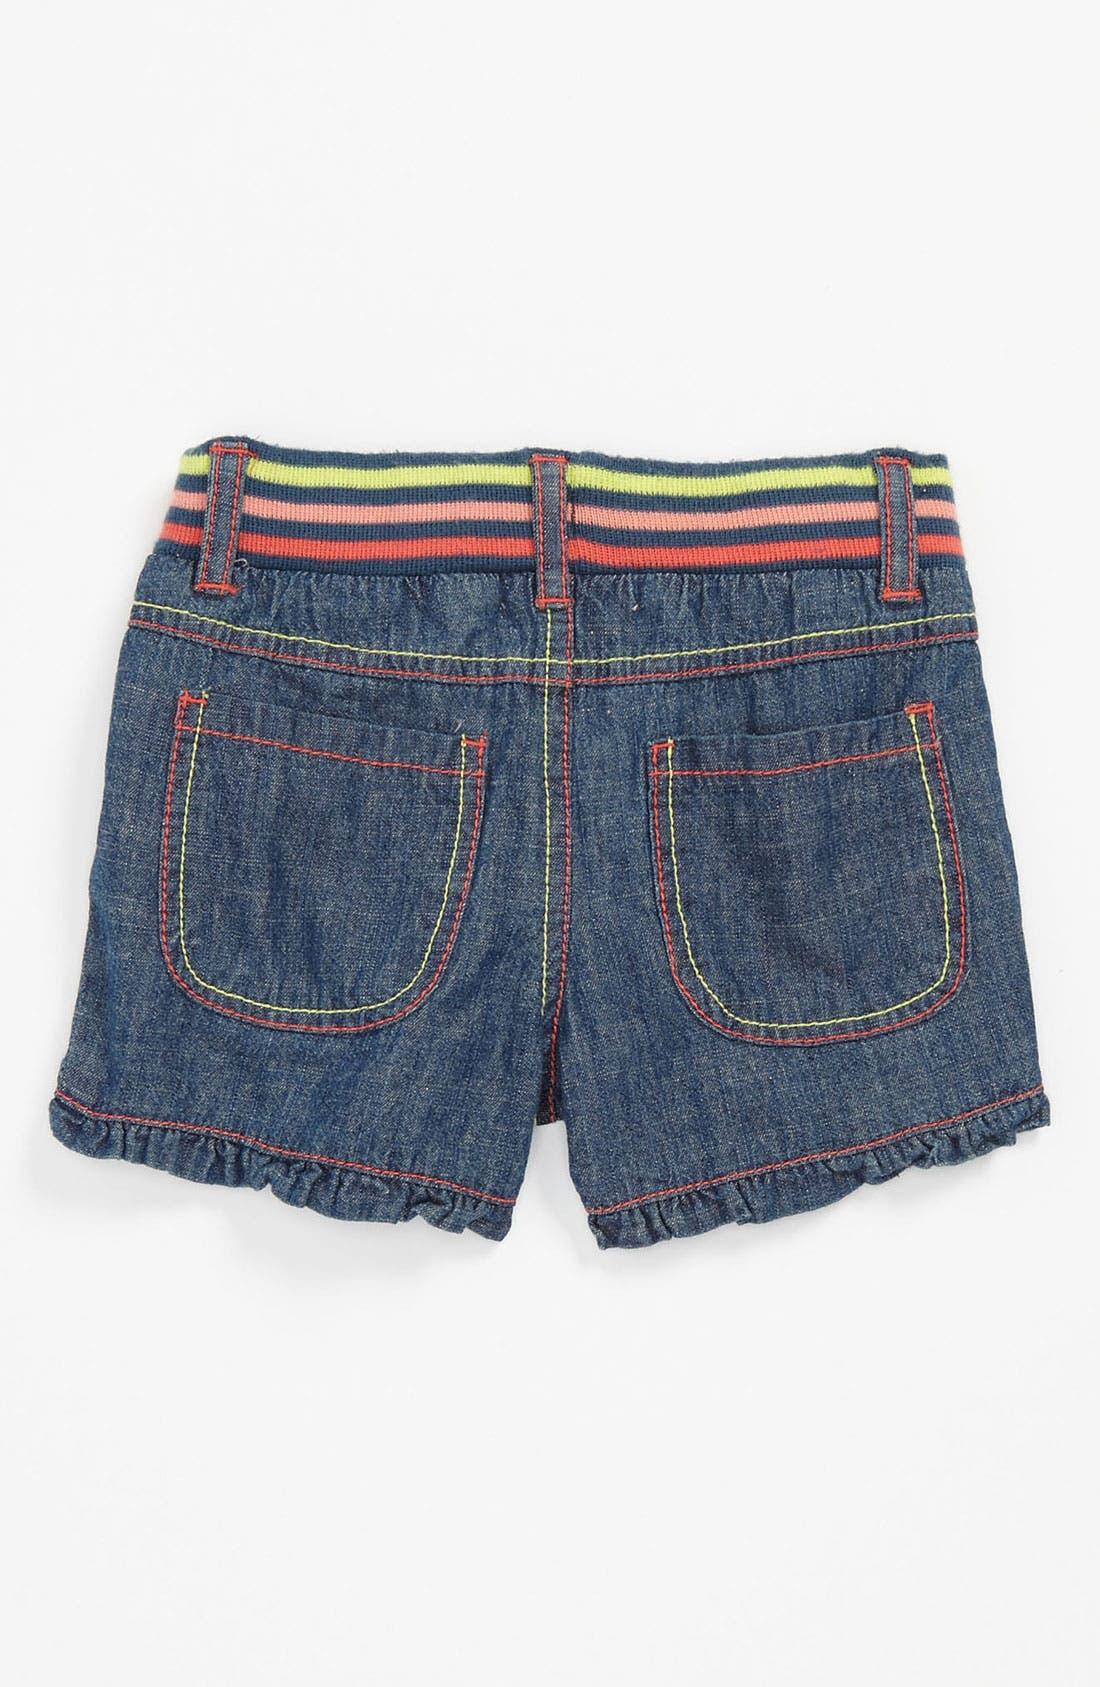 Main Image - Pumpkin Patch Denim Shorts (Baby)